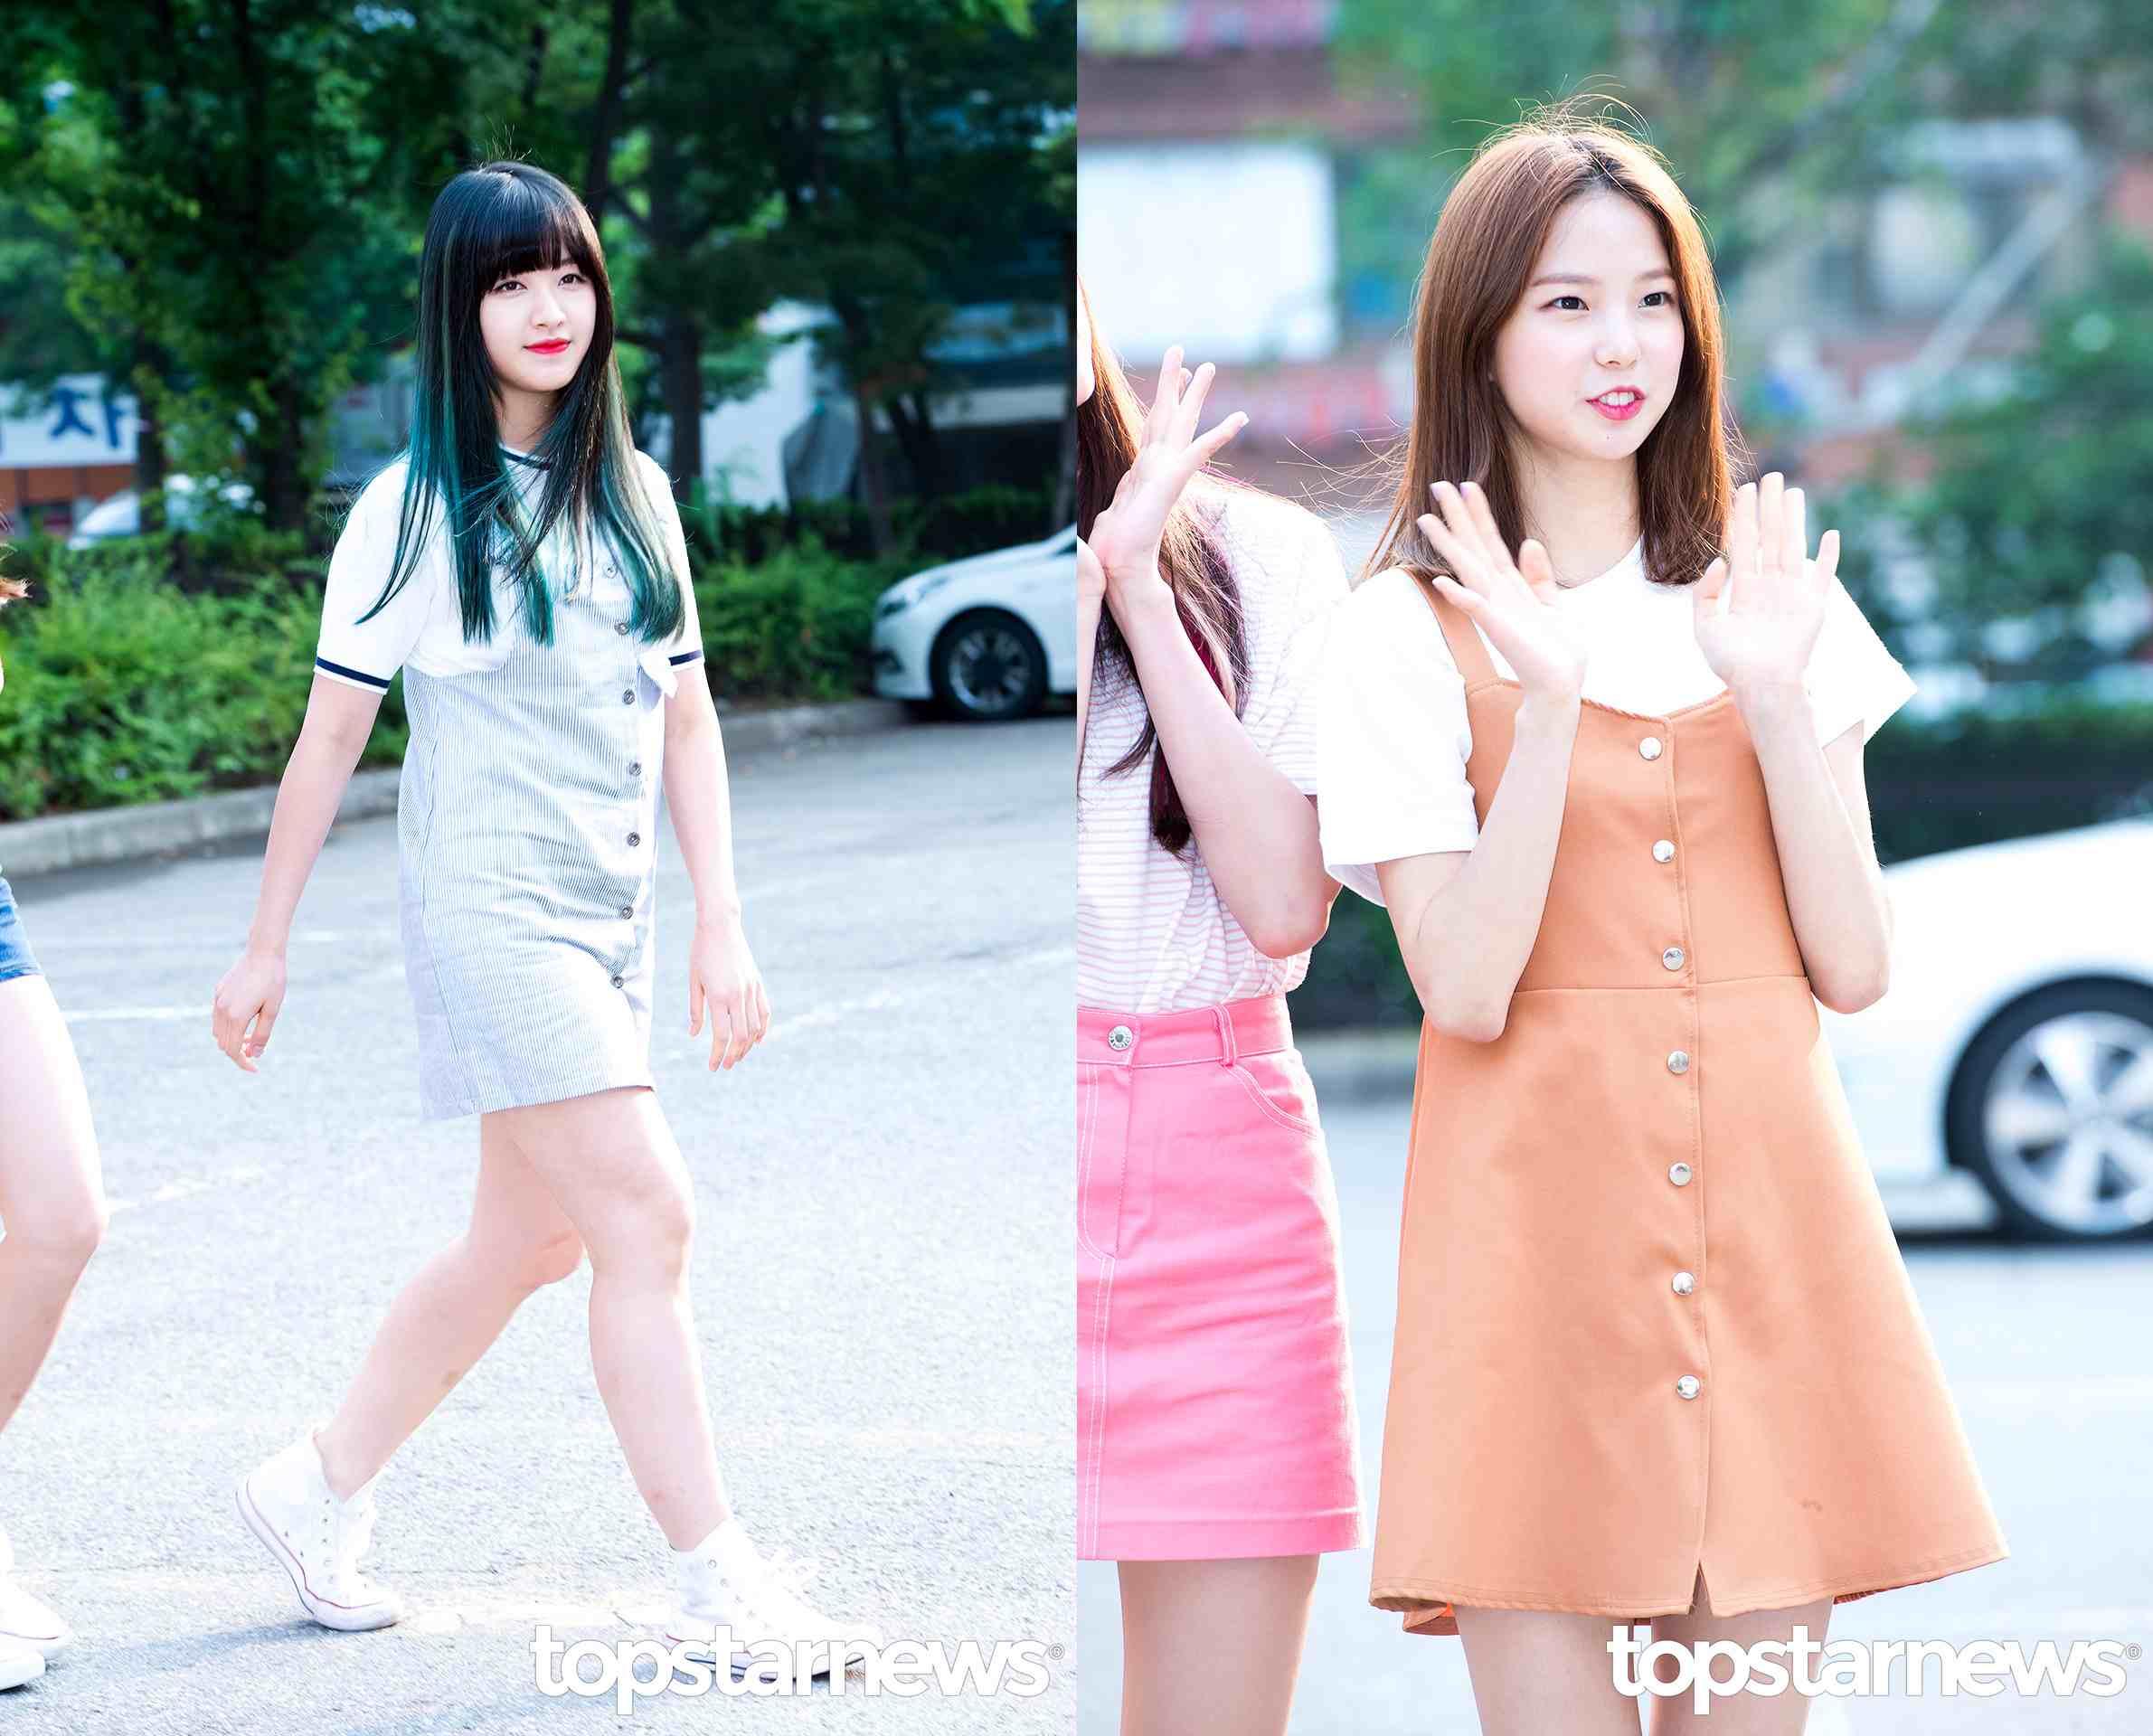 Style② 吊帶裙 吊帶裙去從年開始就一直很火熱,而今年夏天在剪裁上更流行這種前面是繫釦的設計,CLC的 Seung Hee和Yu Jin在最近的上班私服都選擇了這種設計的吊帶裙。內搭一件白T就可以馬上出門了。